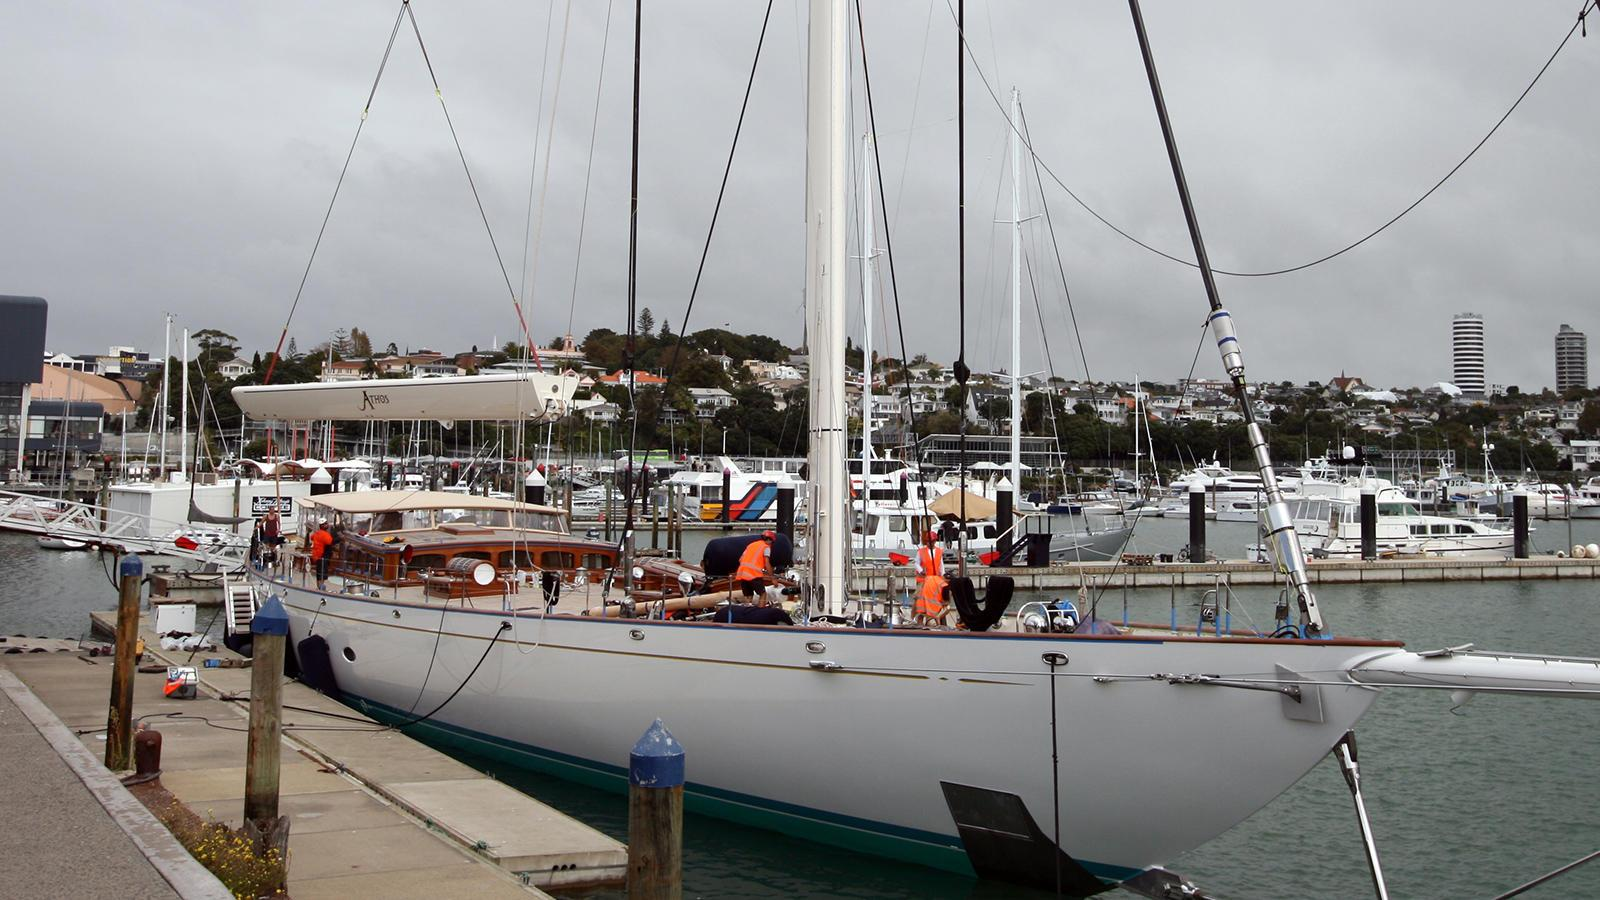 athos-sailing-yacht-holland-jachtbouw-2010-62m-moored-post-refit